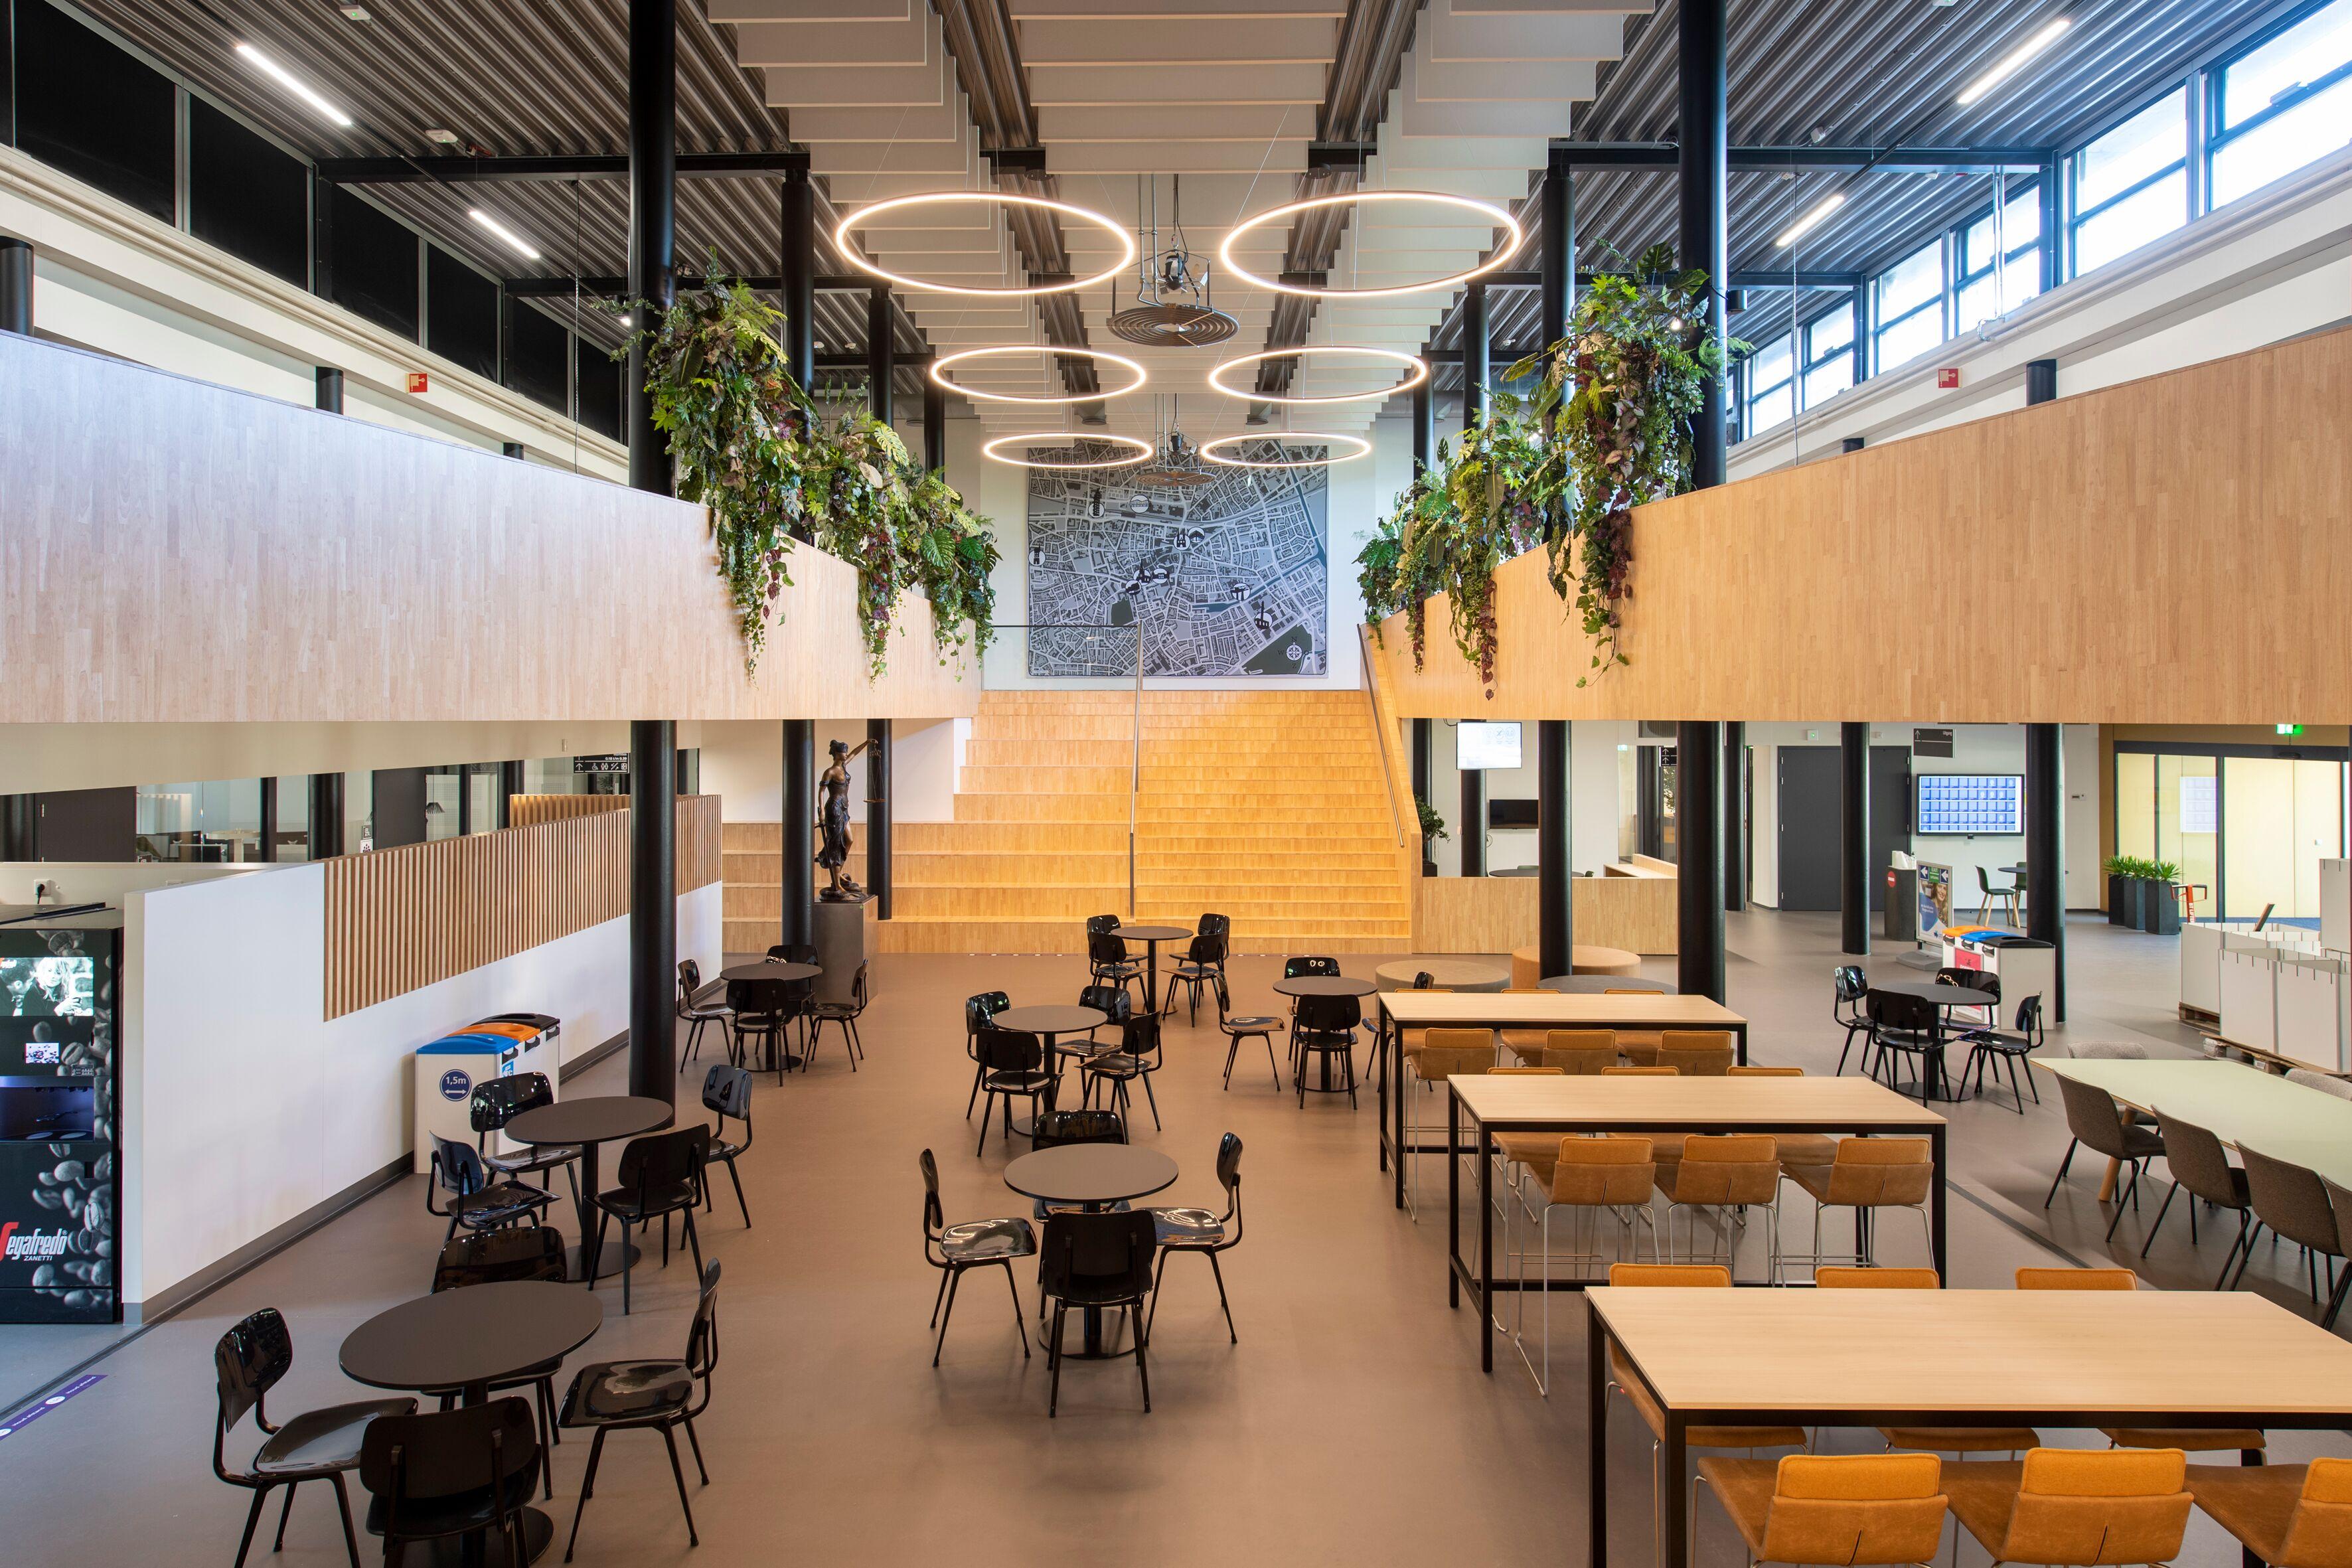 Avans & Fontys Juridische Hogeschool